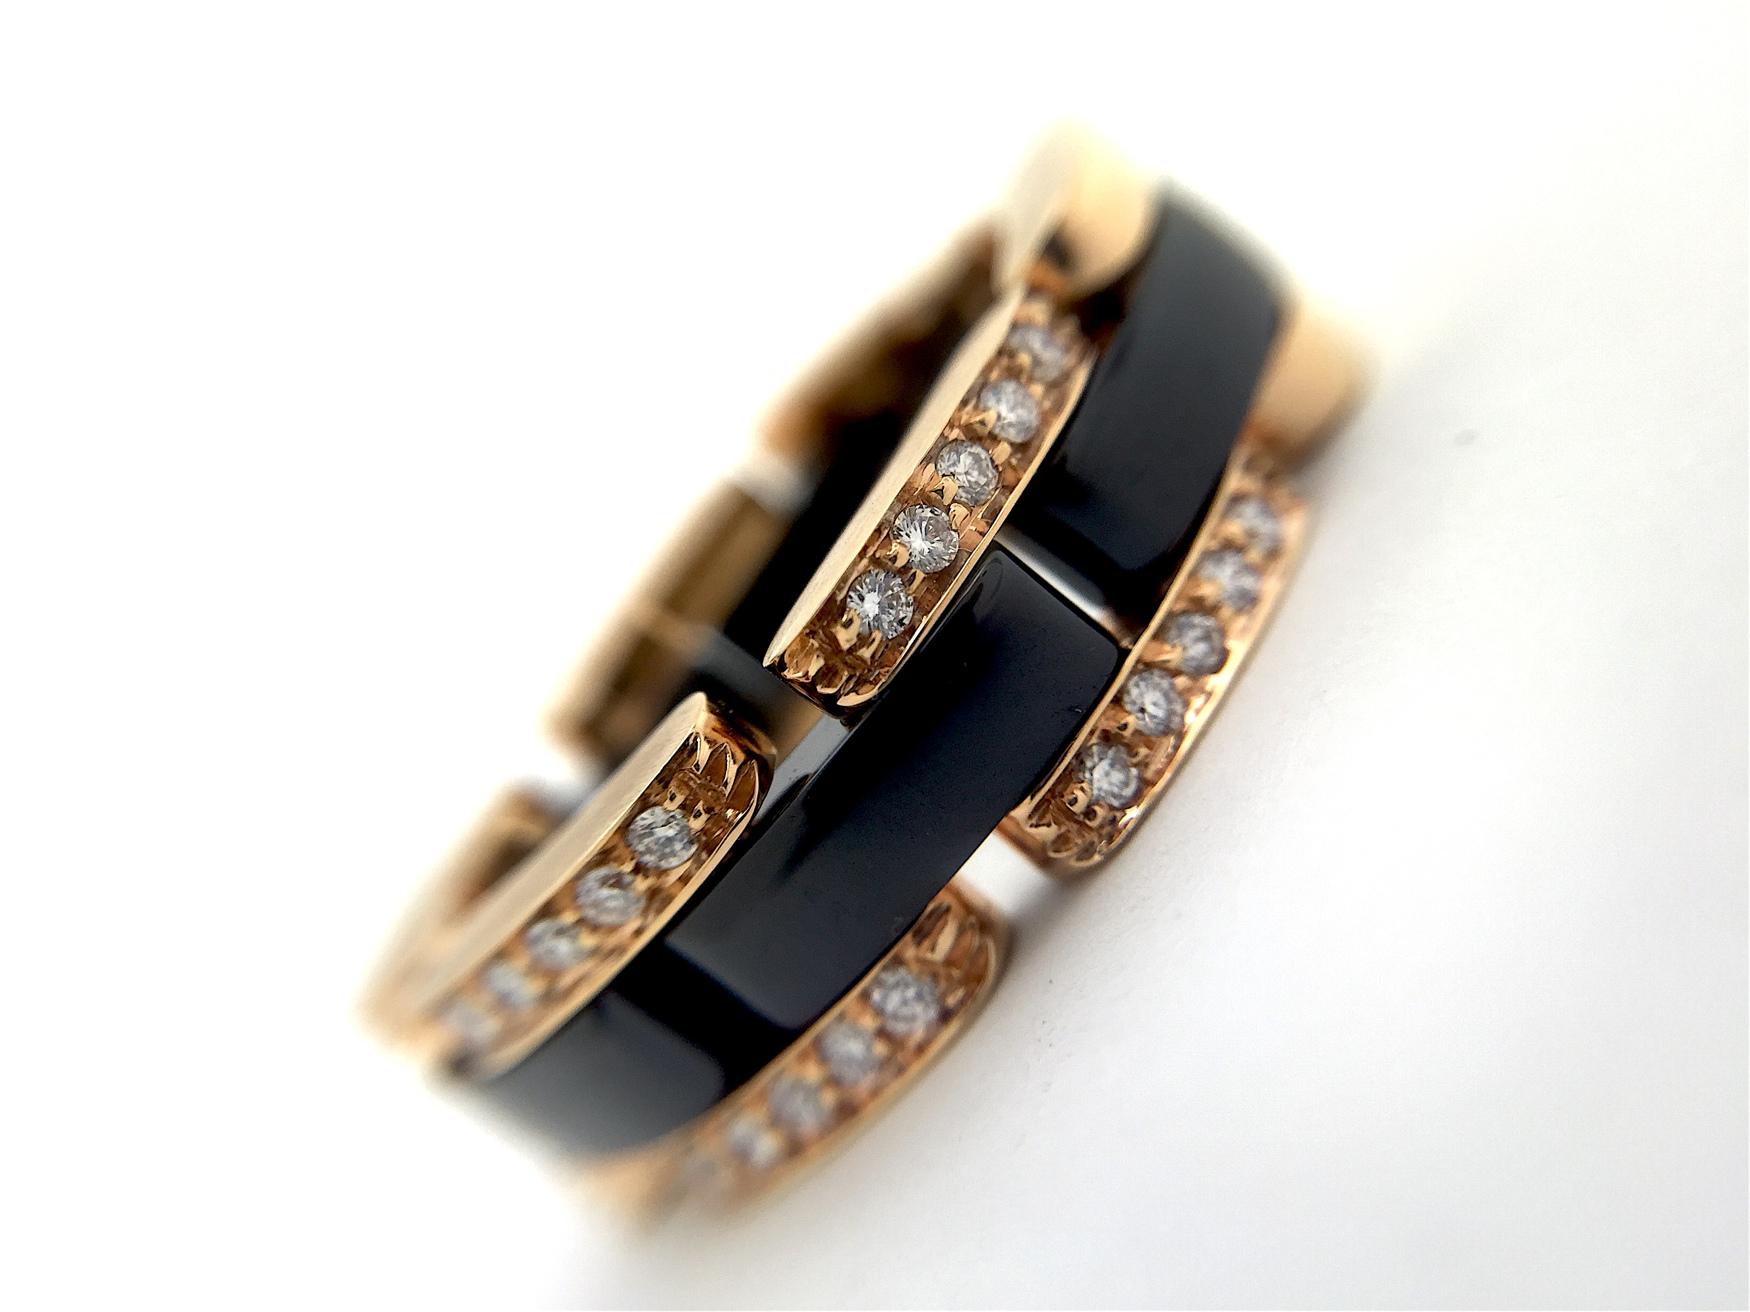 Sensi joyas alta joyería Granada plata compromiso Oro Rosa